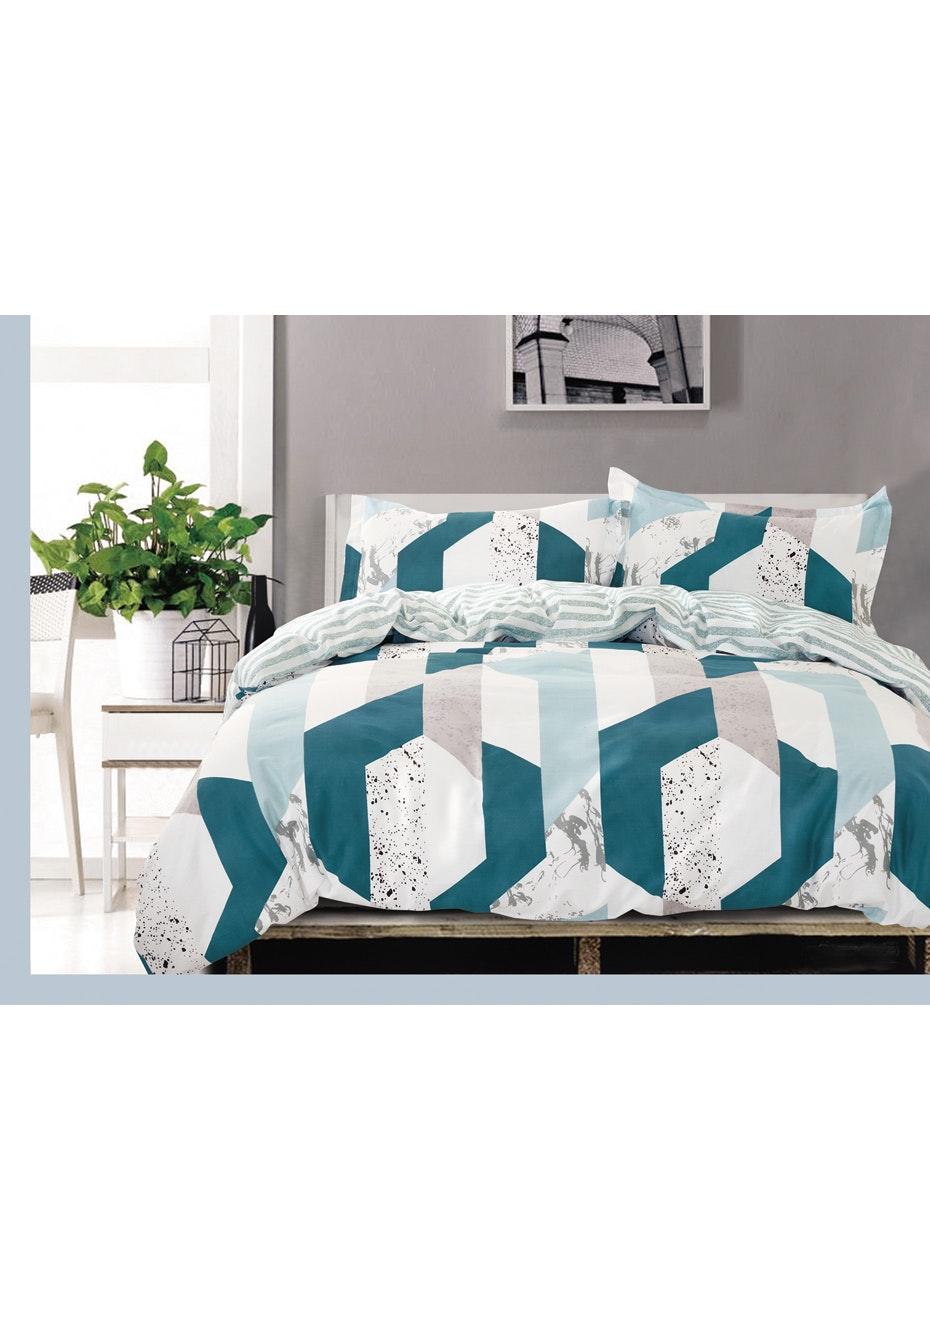 Marble Cove Quilt Cover Set - Reversible Design - 100% Cotton - Single Bed